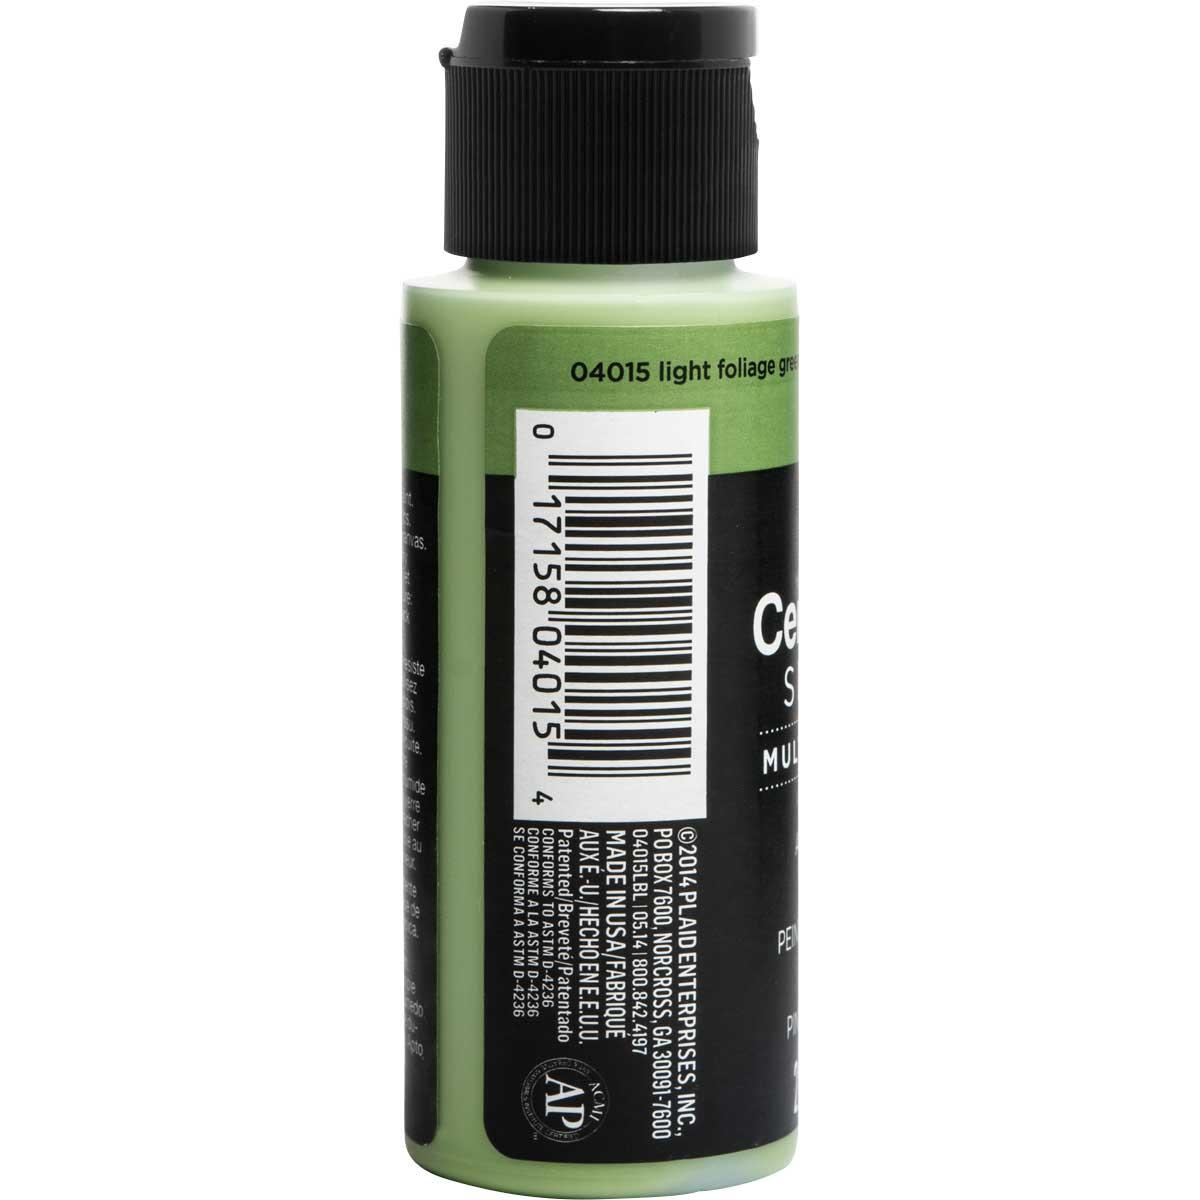 Delta Ceramcoat ® Select Multi-Surface Acrylic Paint - Satin - Light Foliage Green, 2 oz. - 04015